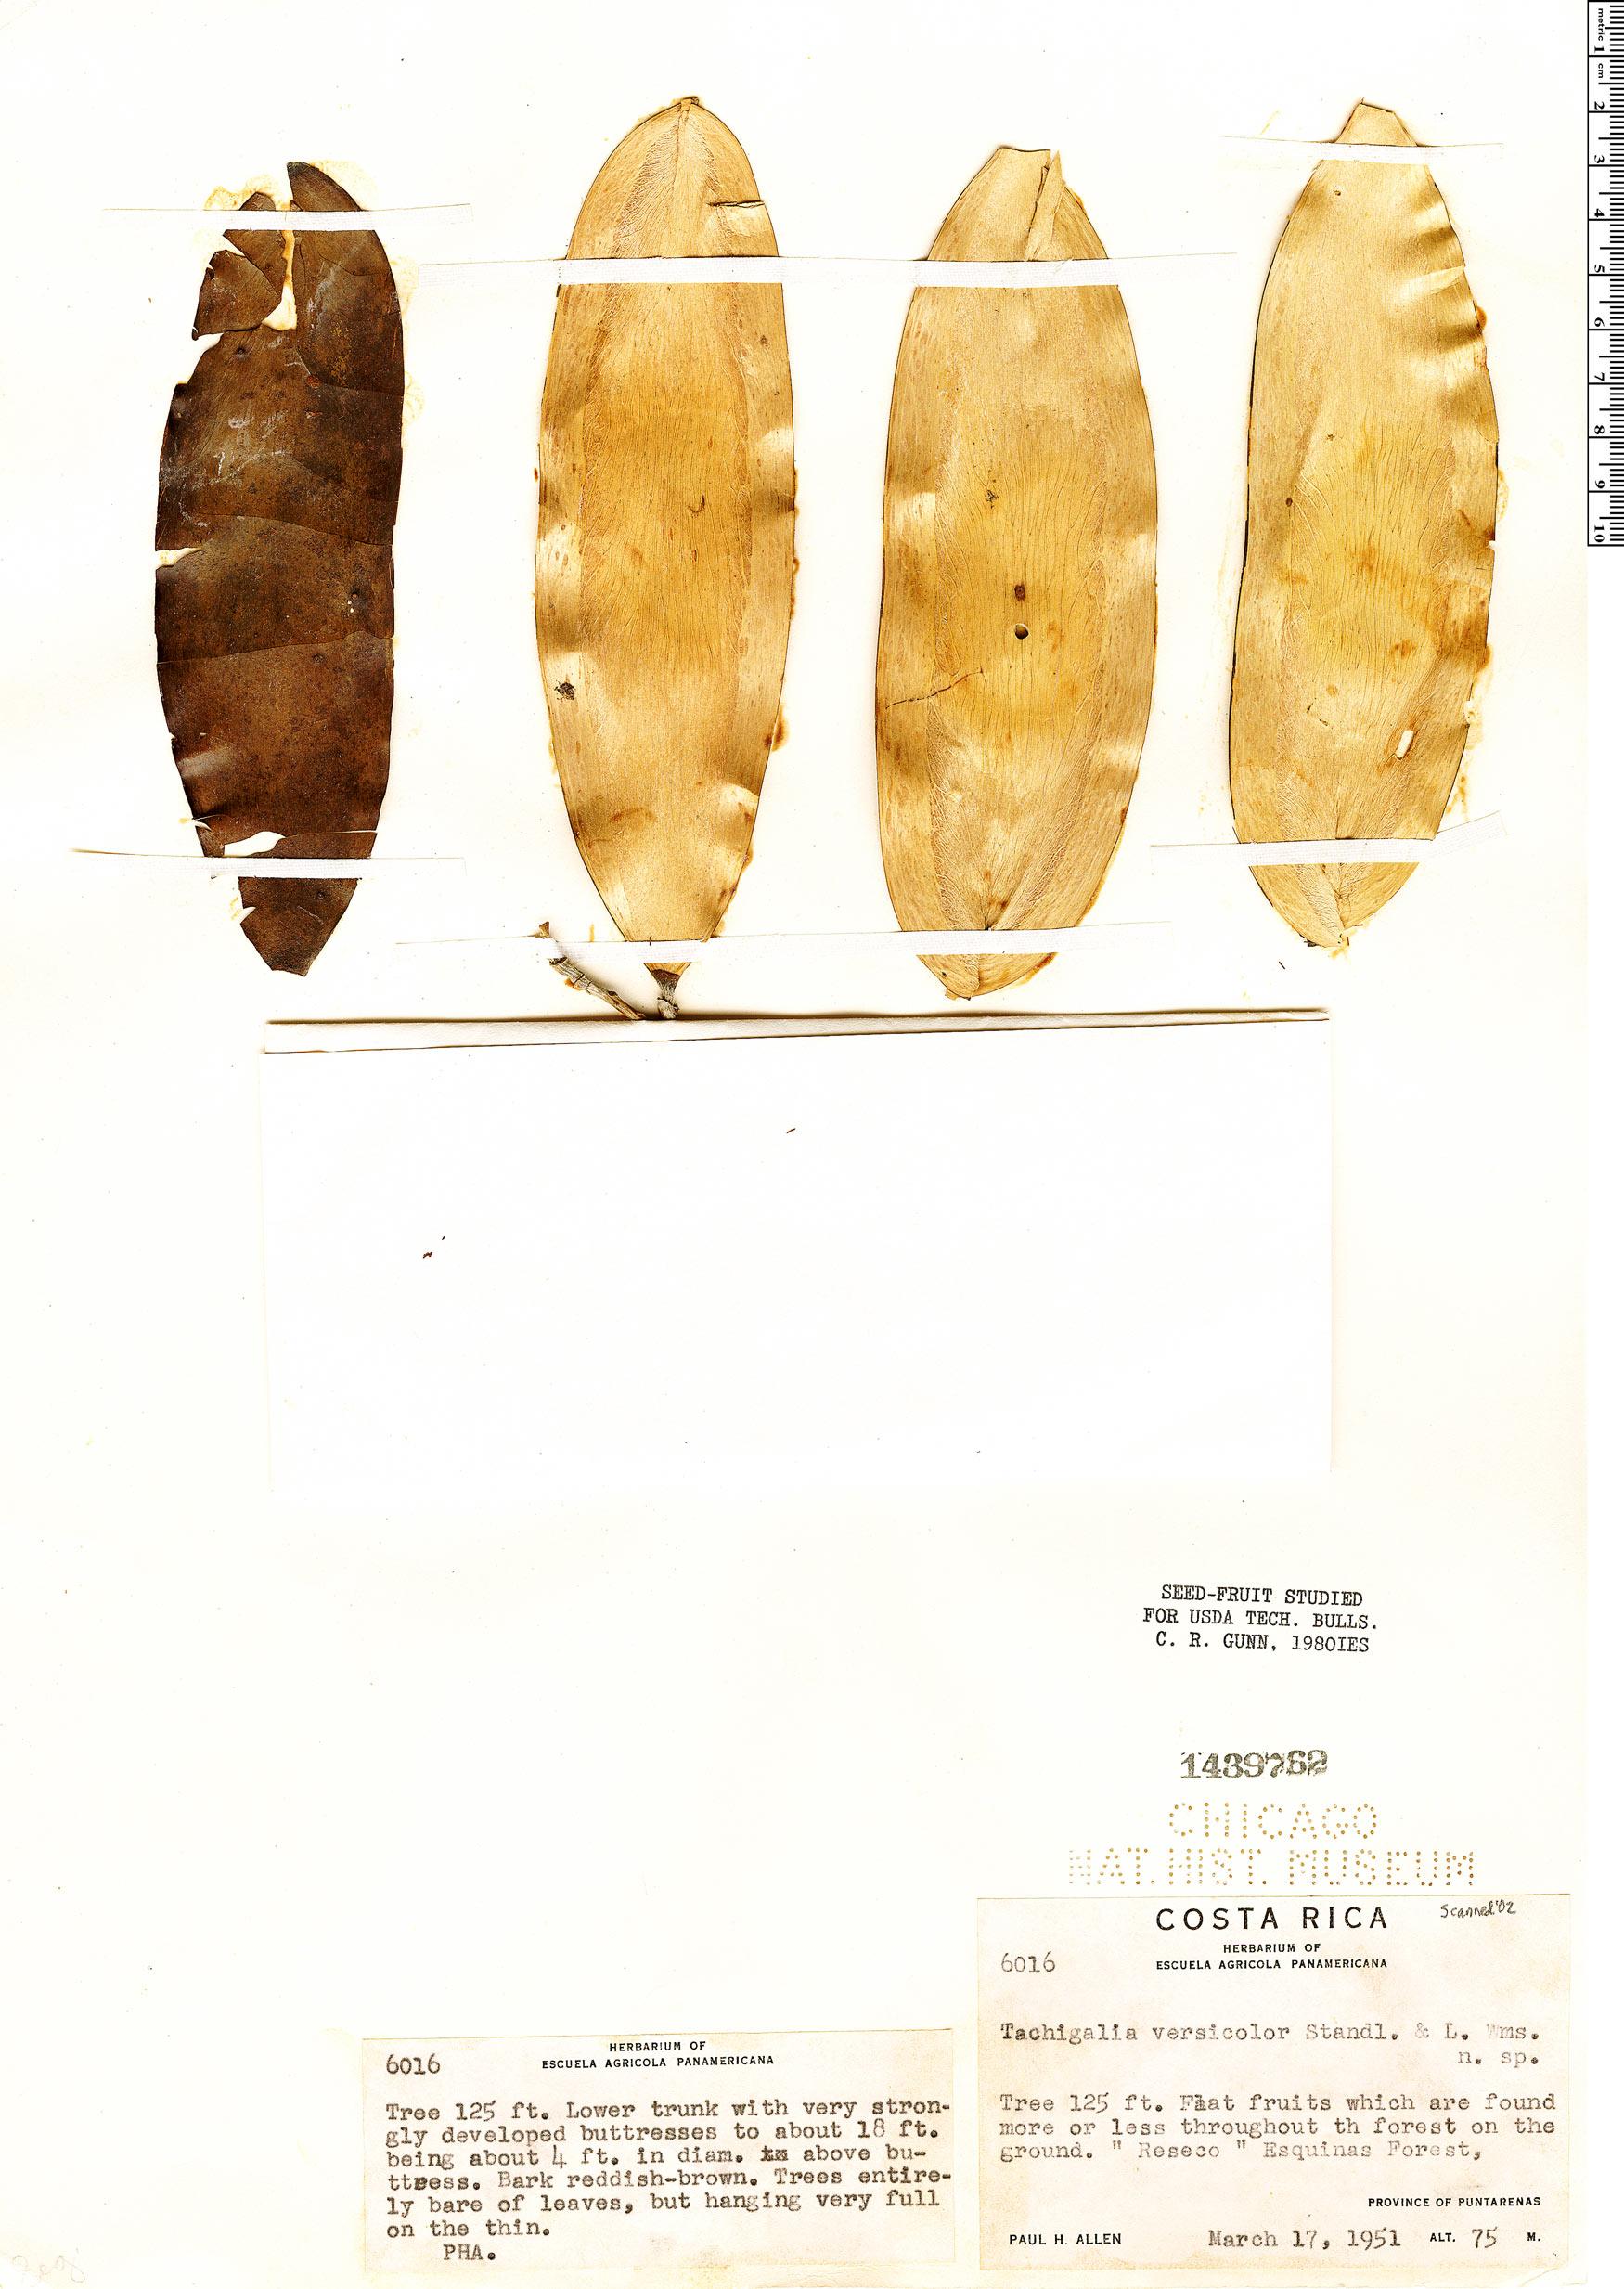 Specimen: Tachigali versicolor